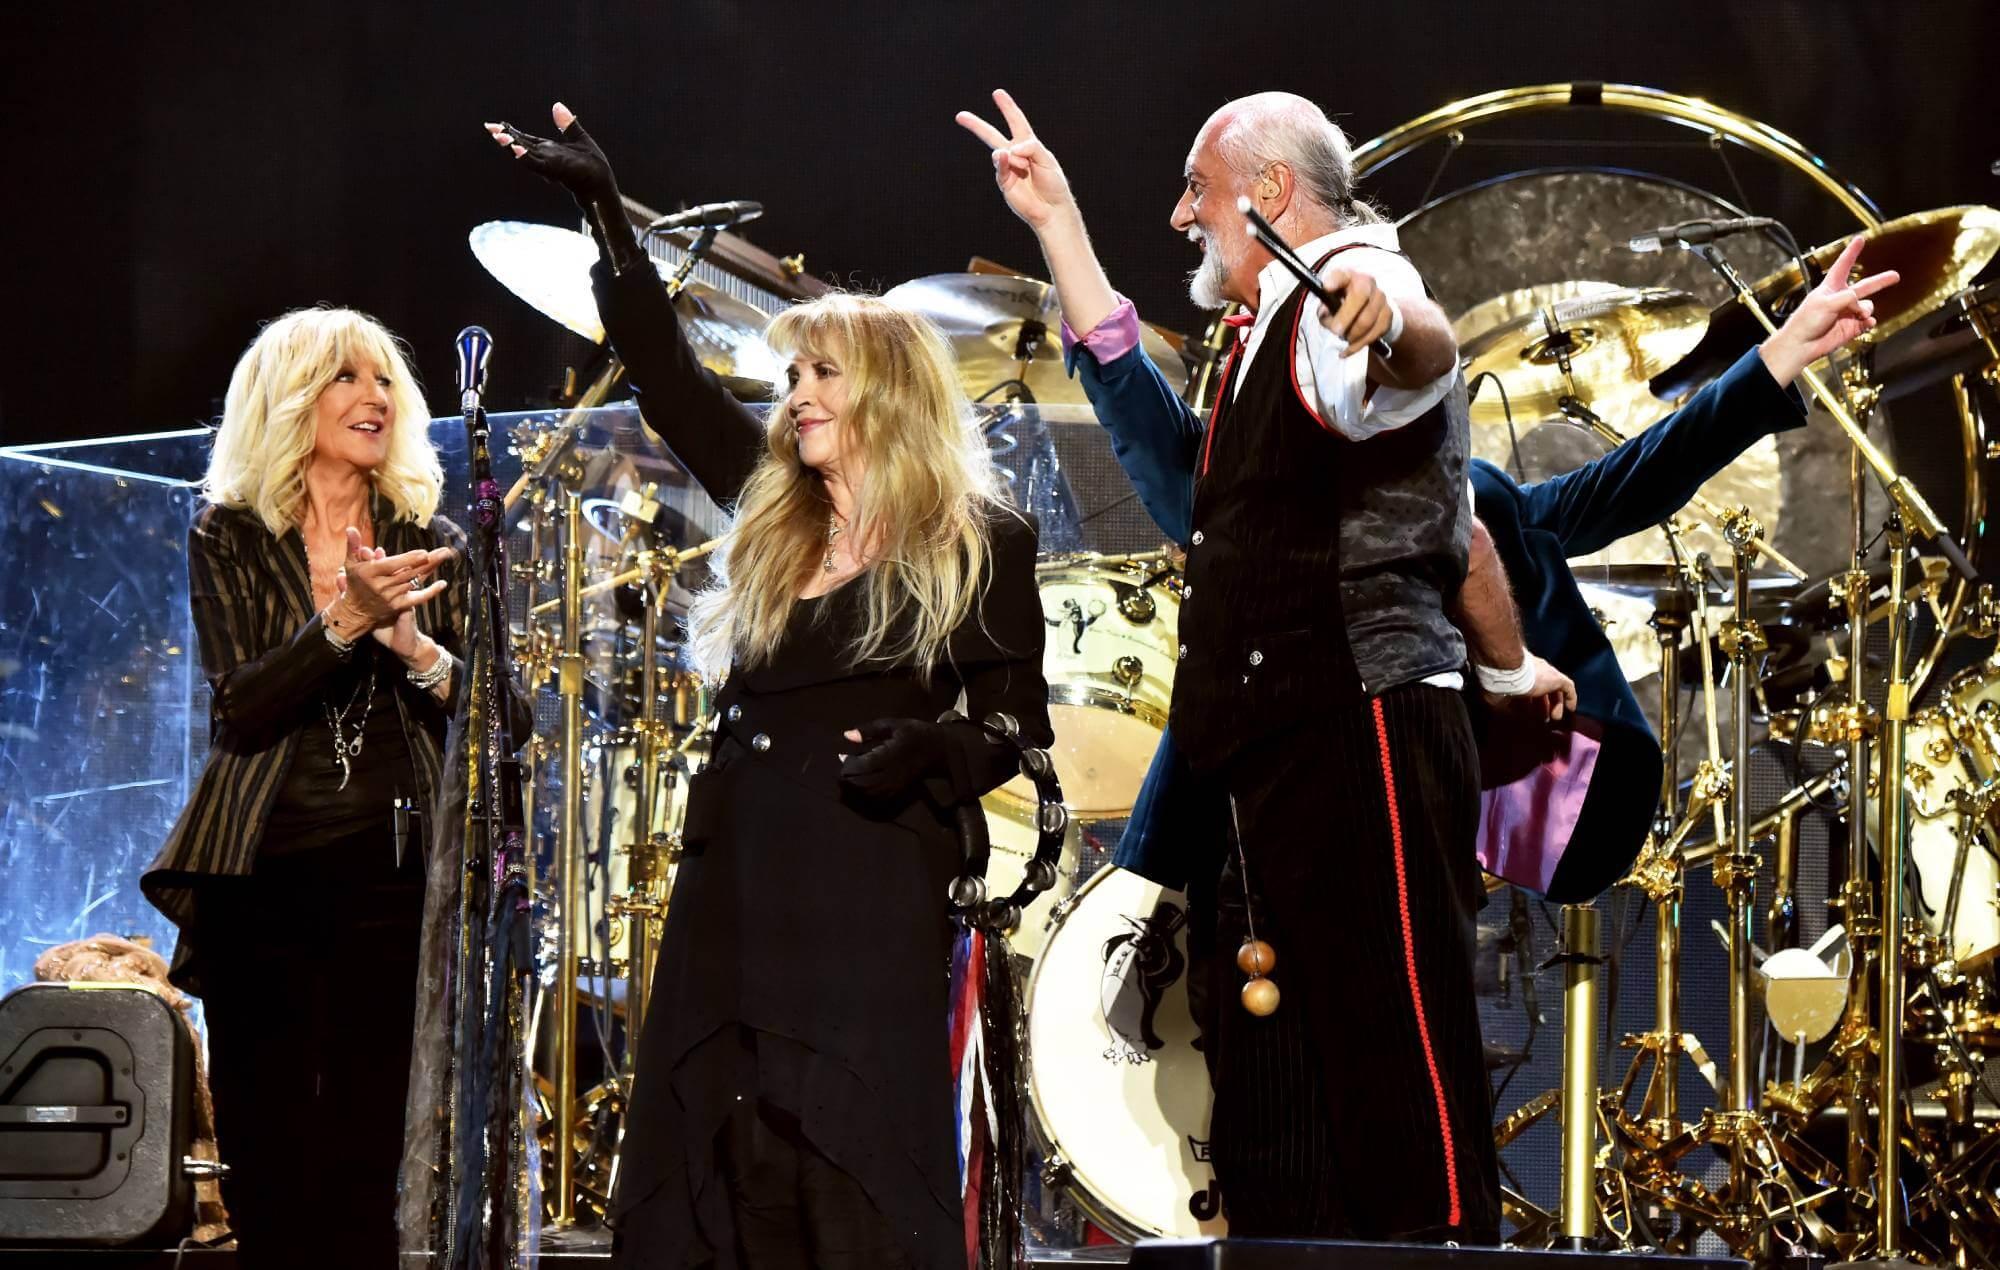 Christine McVie, Stevie Nicks, and Mick Fleetwood of Fleetwood Mac